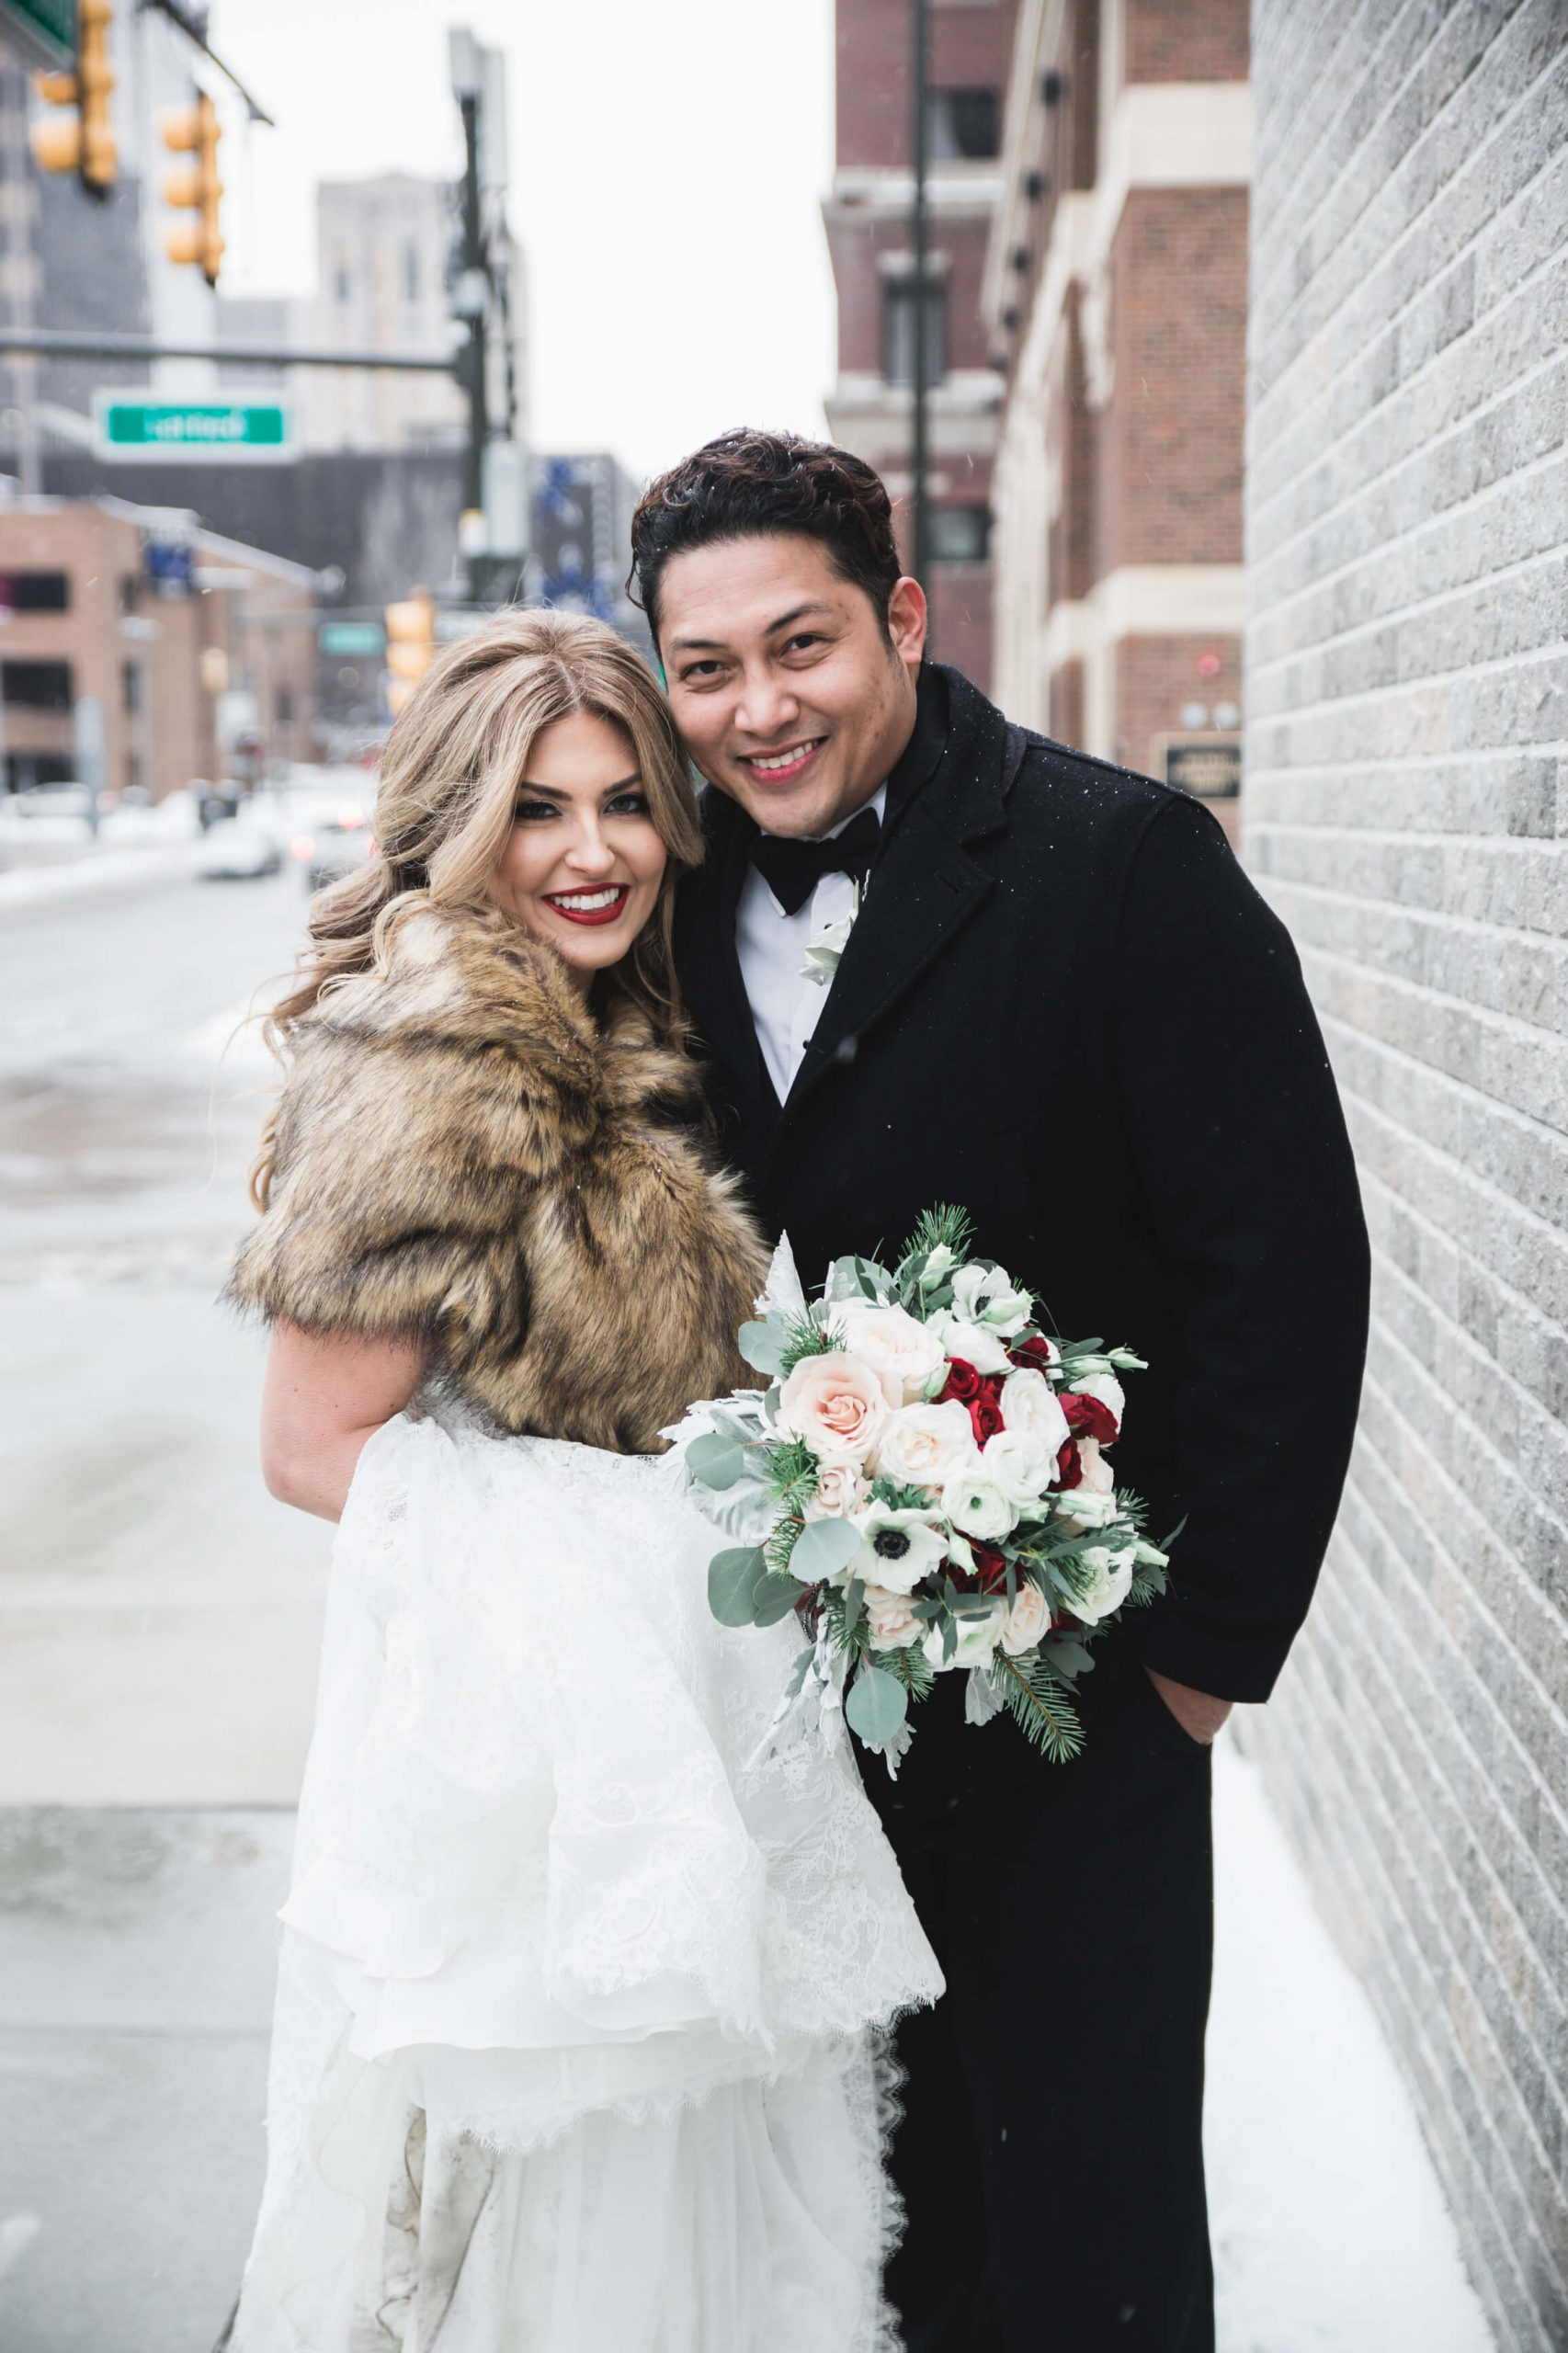 bride and groom romantics outdoors in winter